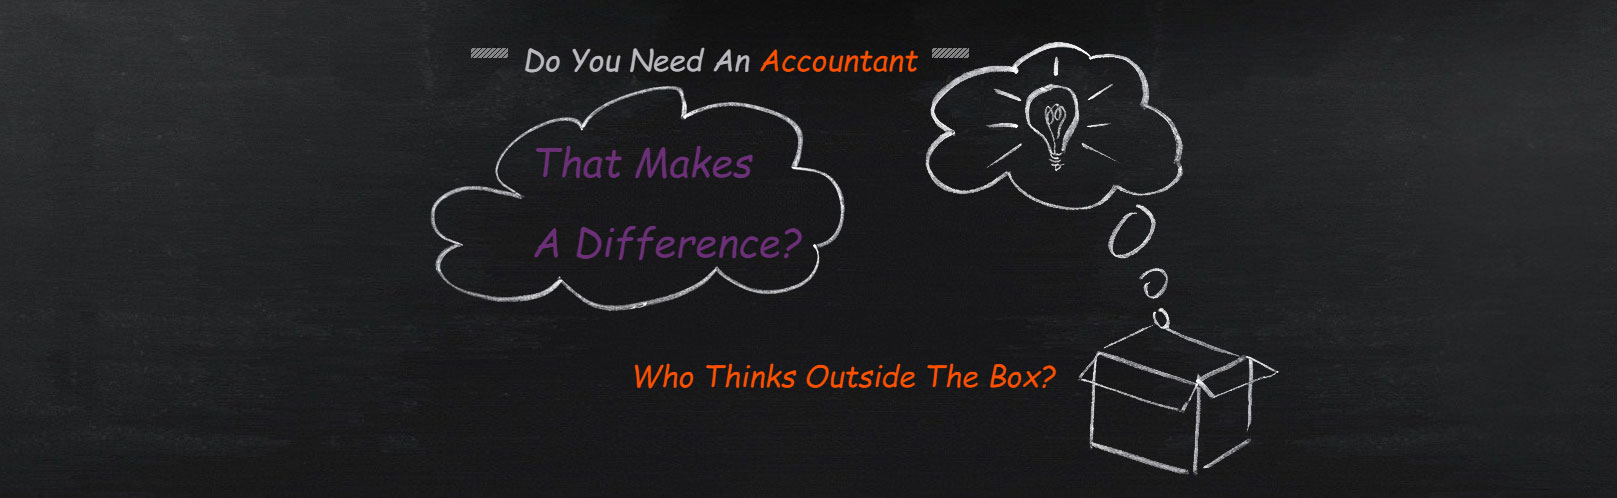 Xebra Accounting - Accountants Fareham